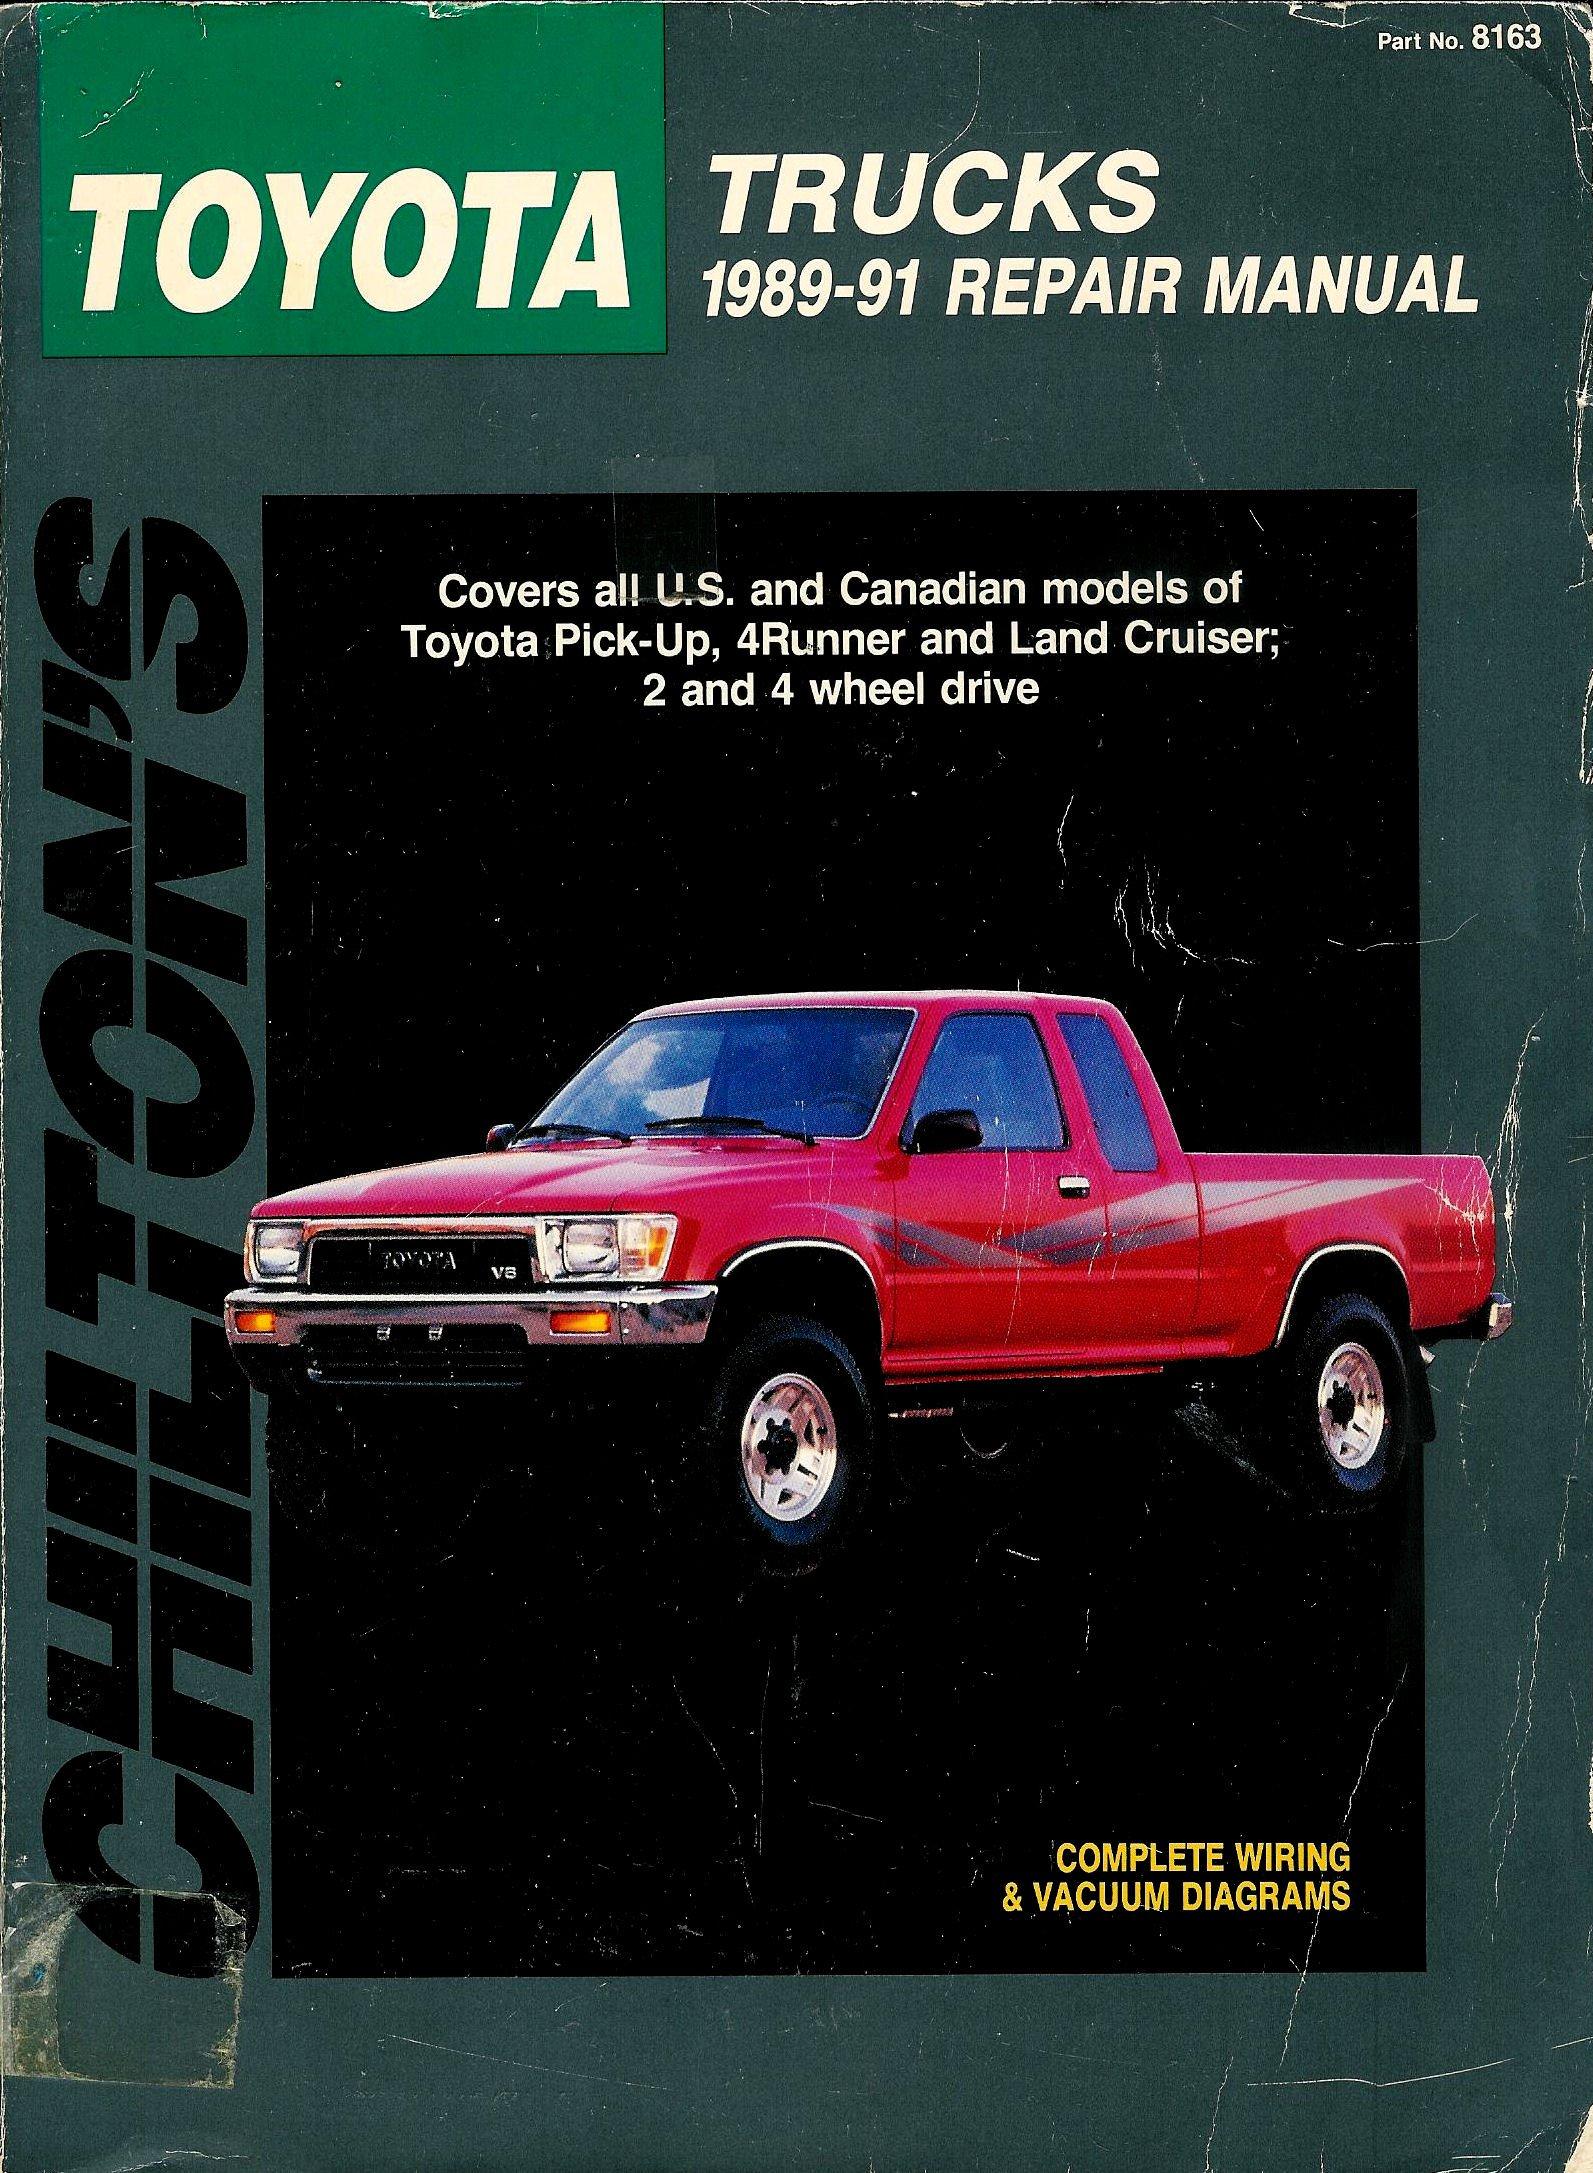 Toyota Trucks 1989 91 Repair Manual Total Car Care Exterior Wiring Diagram P U Chilton Automotive Books 9780801981630